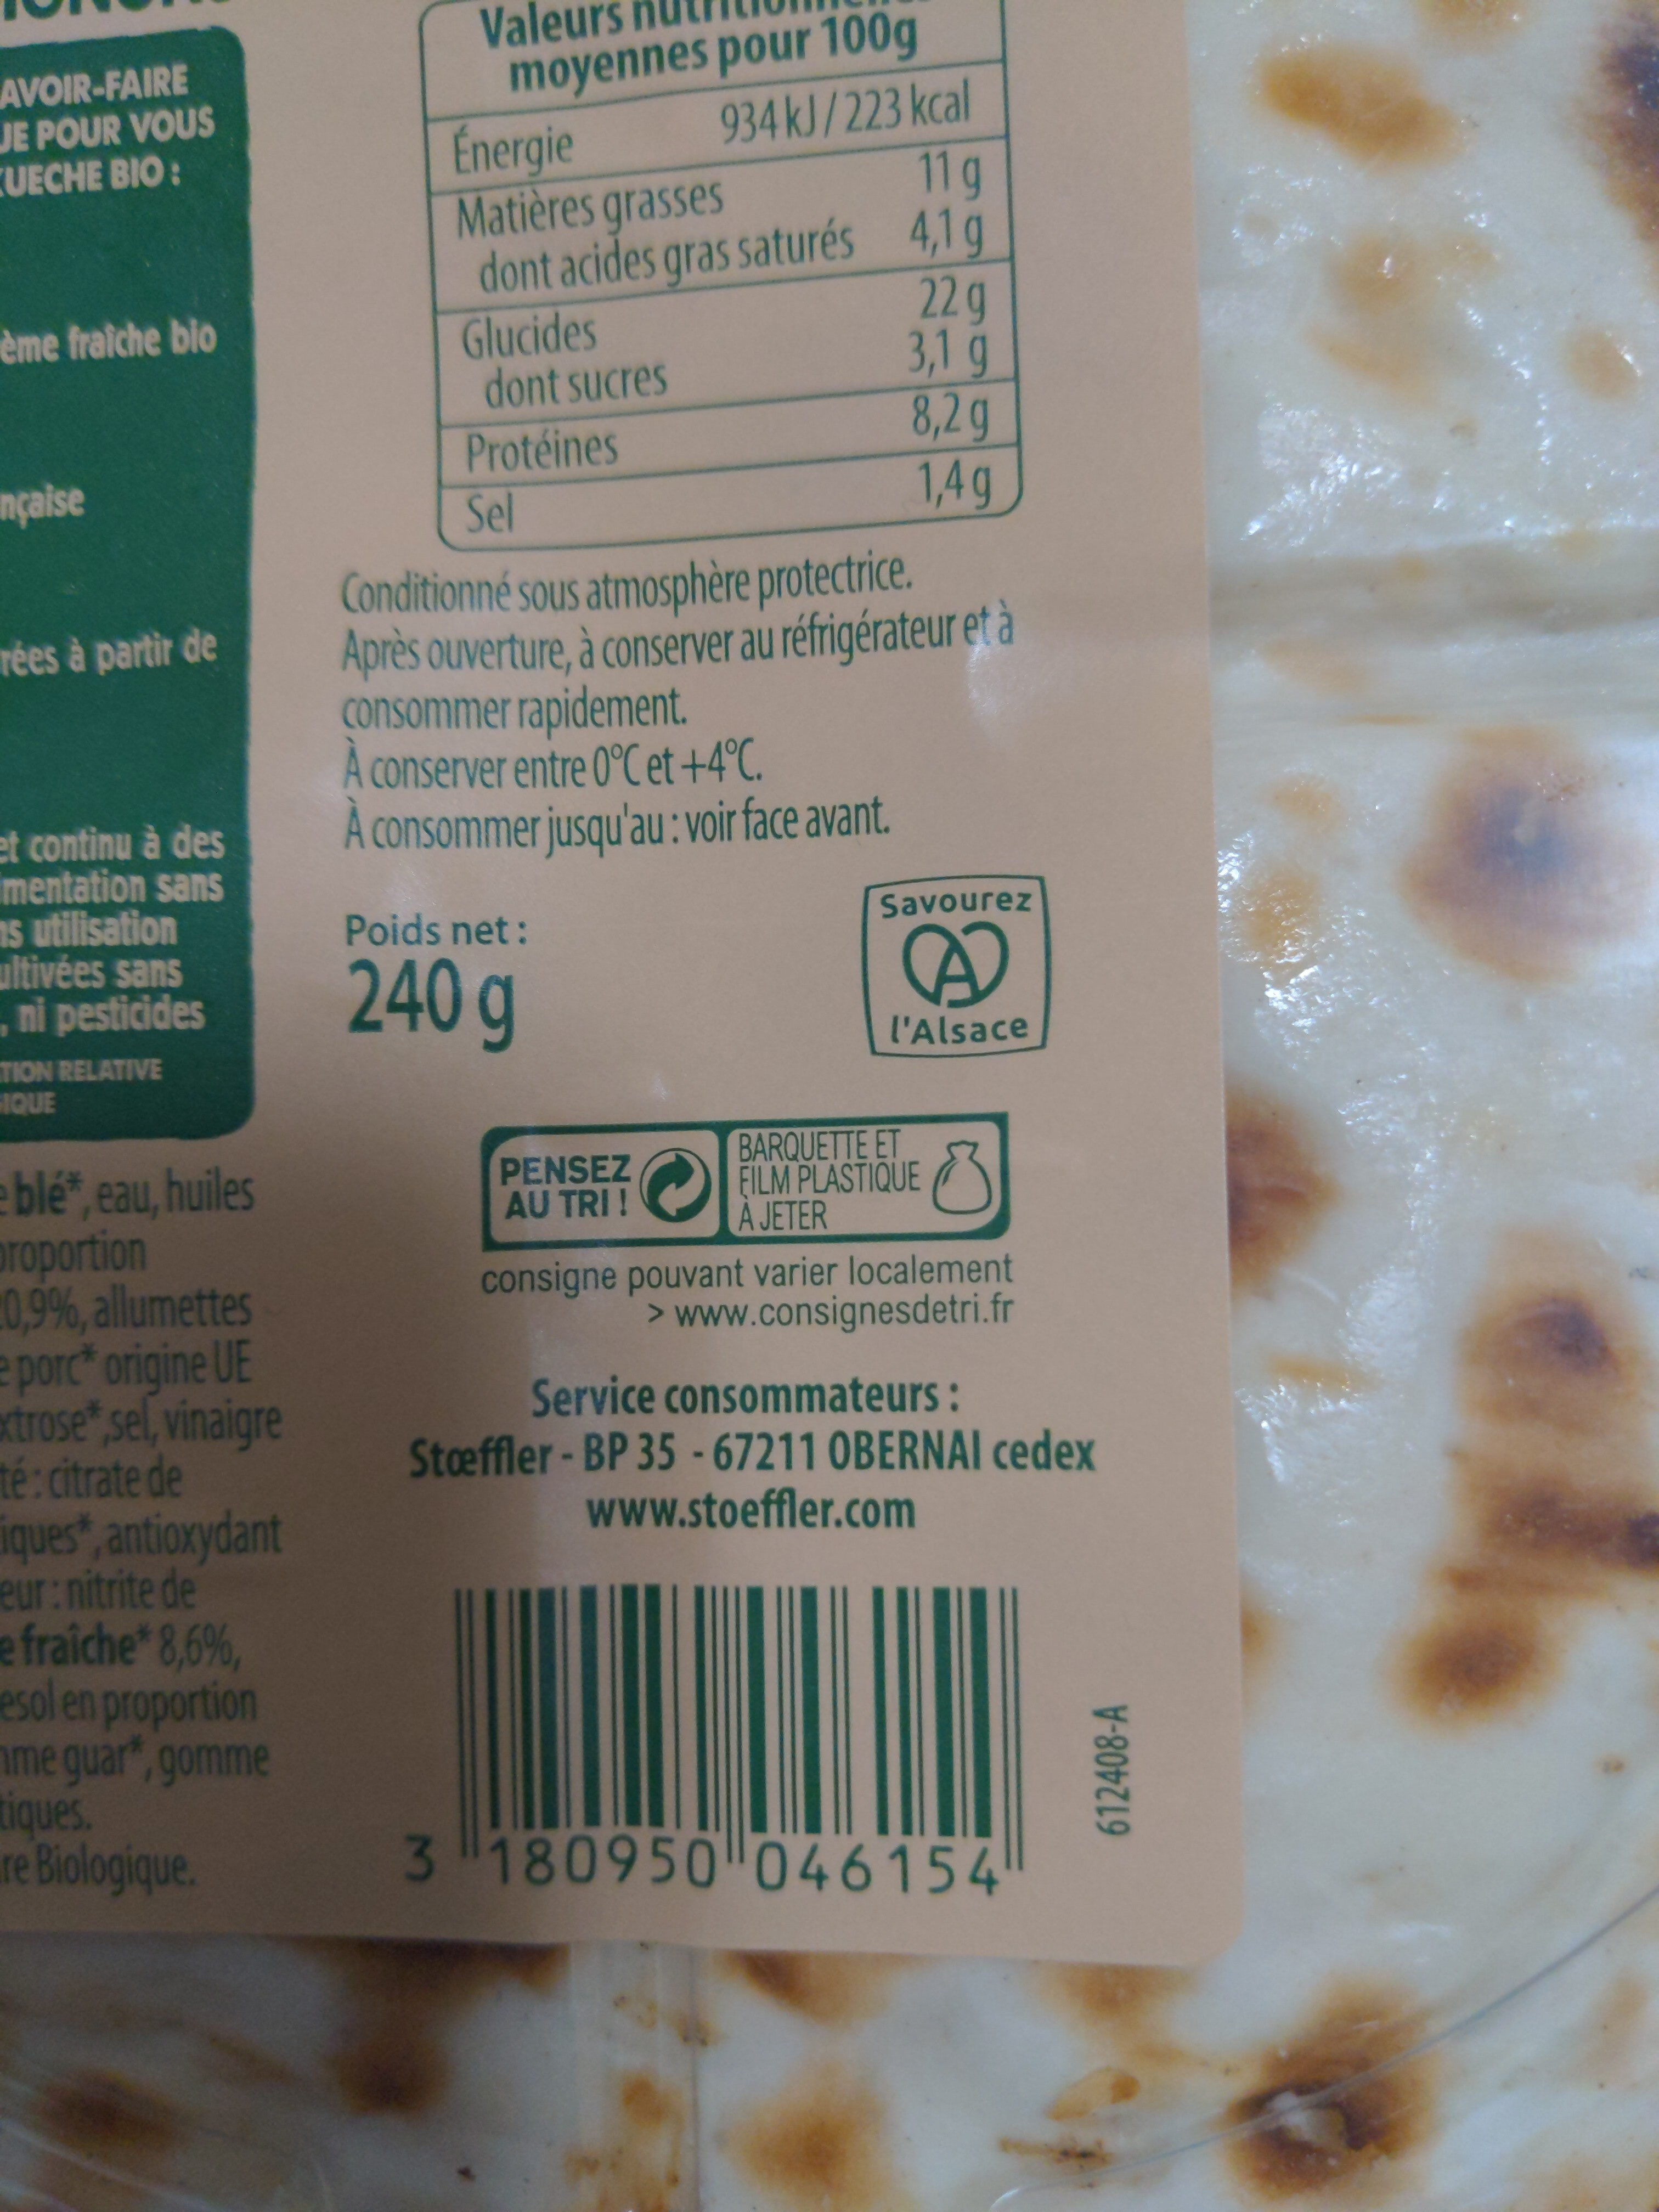 Flammekueche bio X2 fromage blanc allumettes oignons - Instruction de recyclage et/ou informations d'emballage - fr